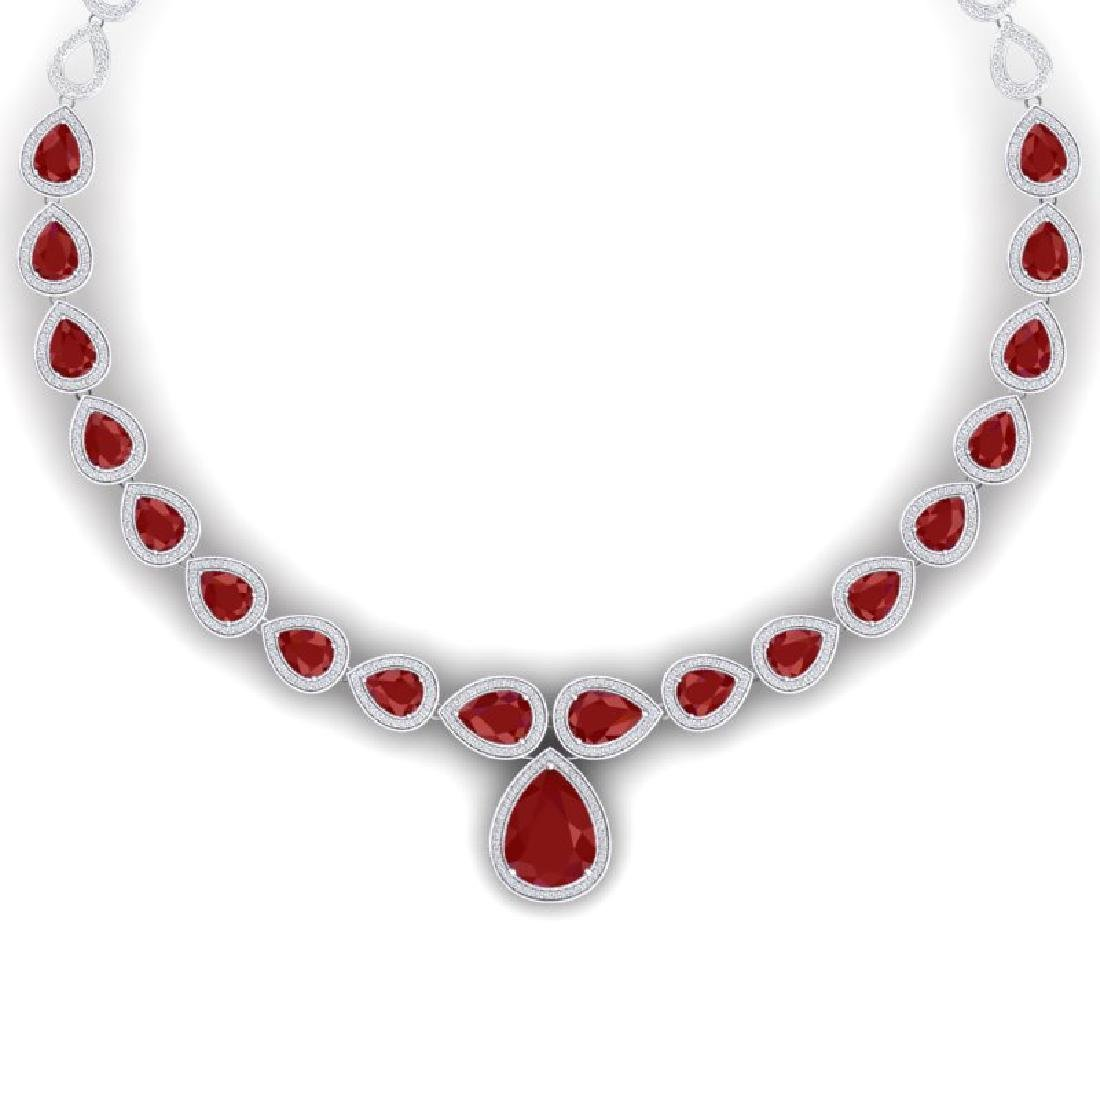 51.41 CTW Royalty Ruby & VS Diamond Necklace 18K White